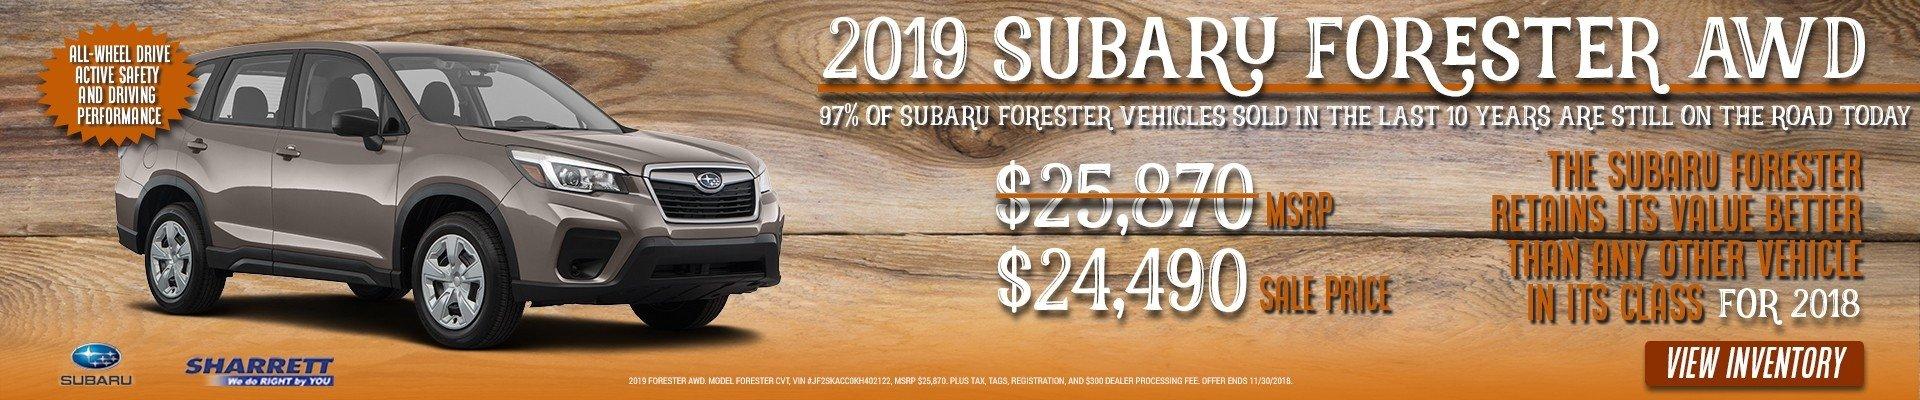 Get a 2019 Subaru Forester AWD for $24,490 at Sharrett Subaru of Hagertown, MD